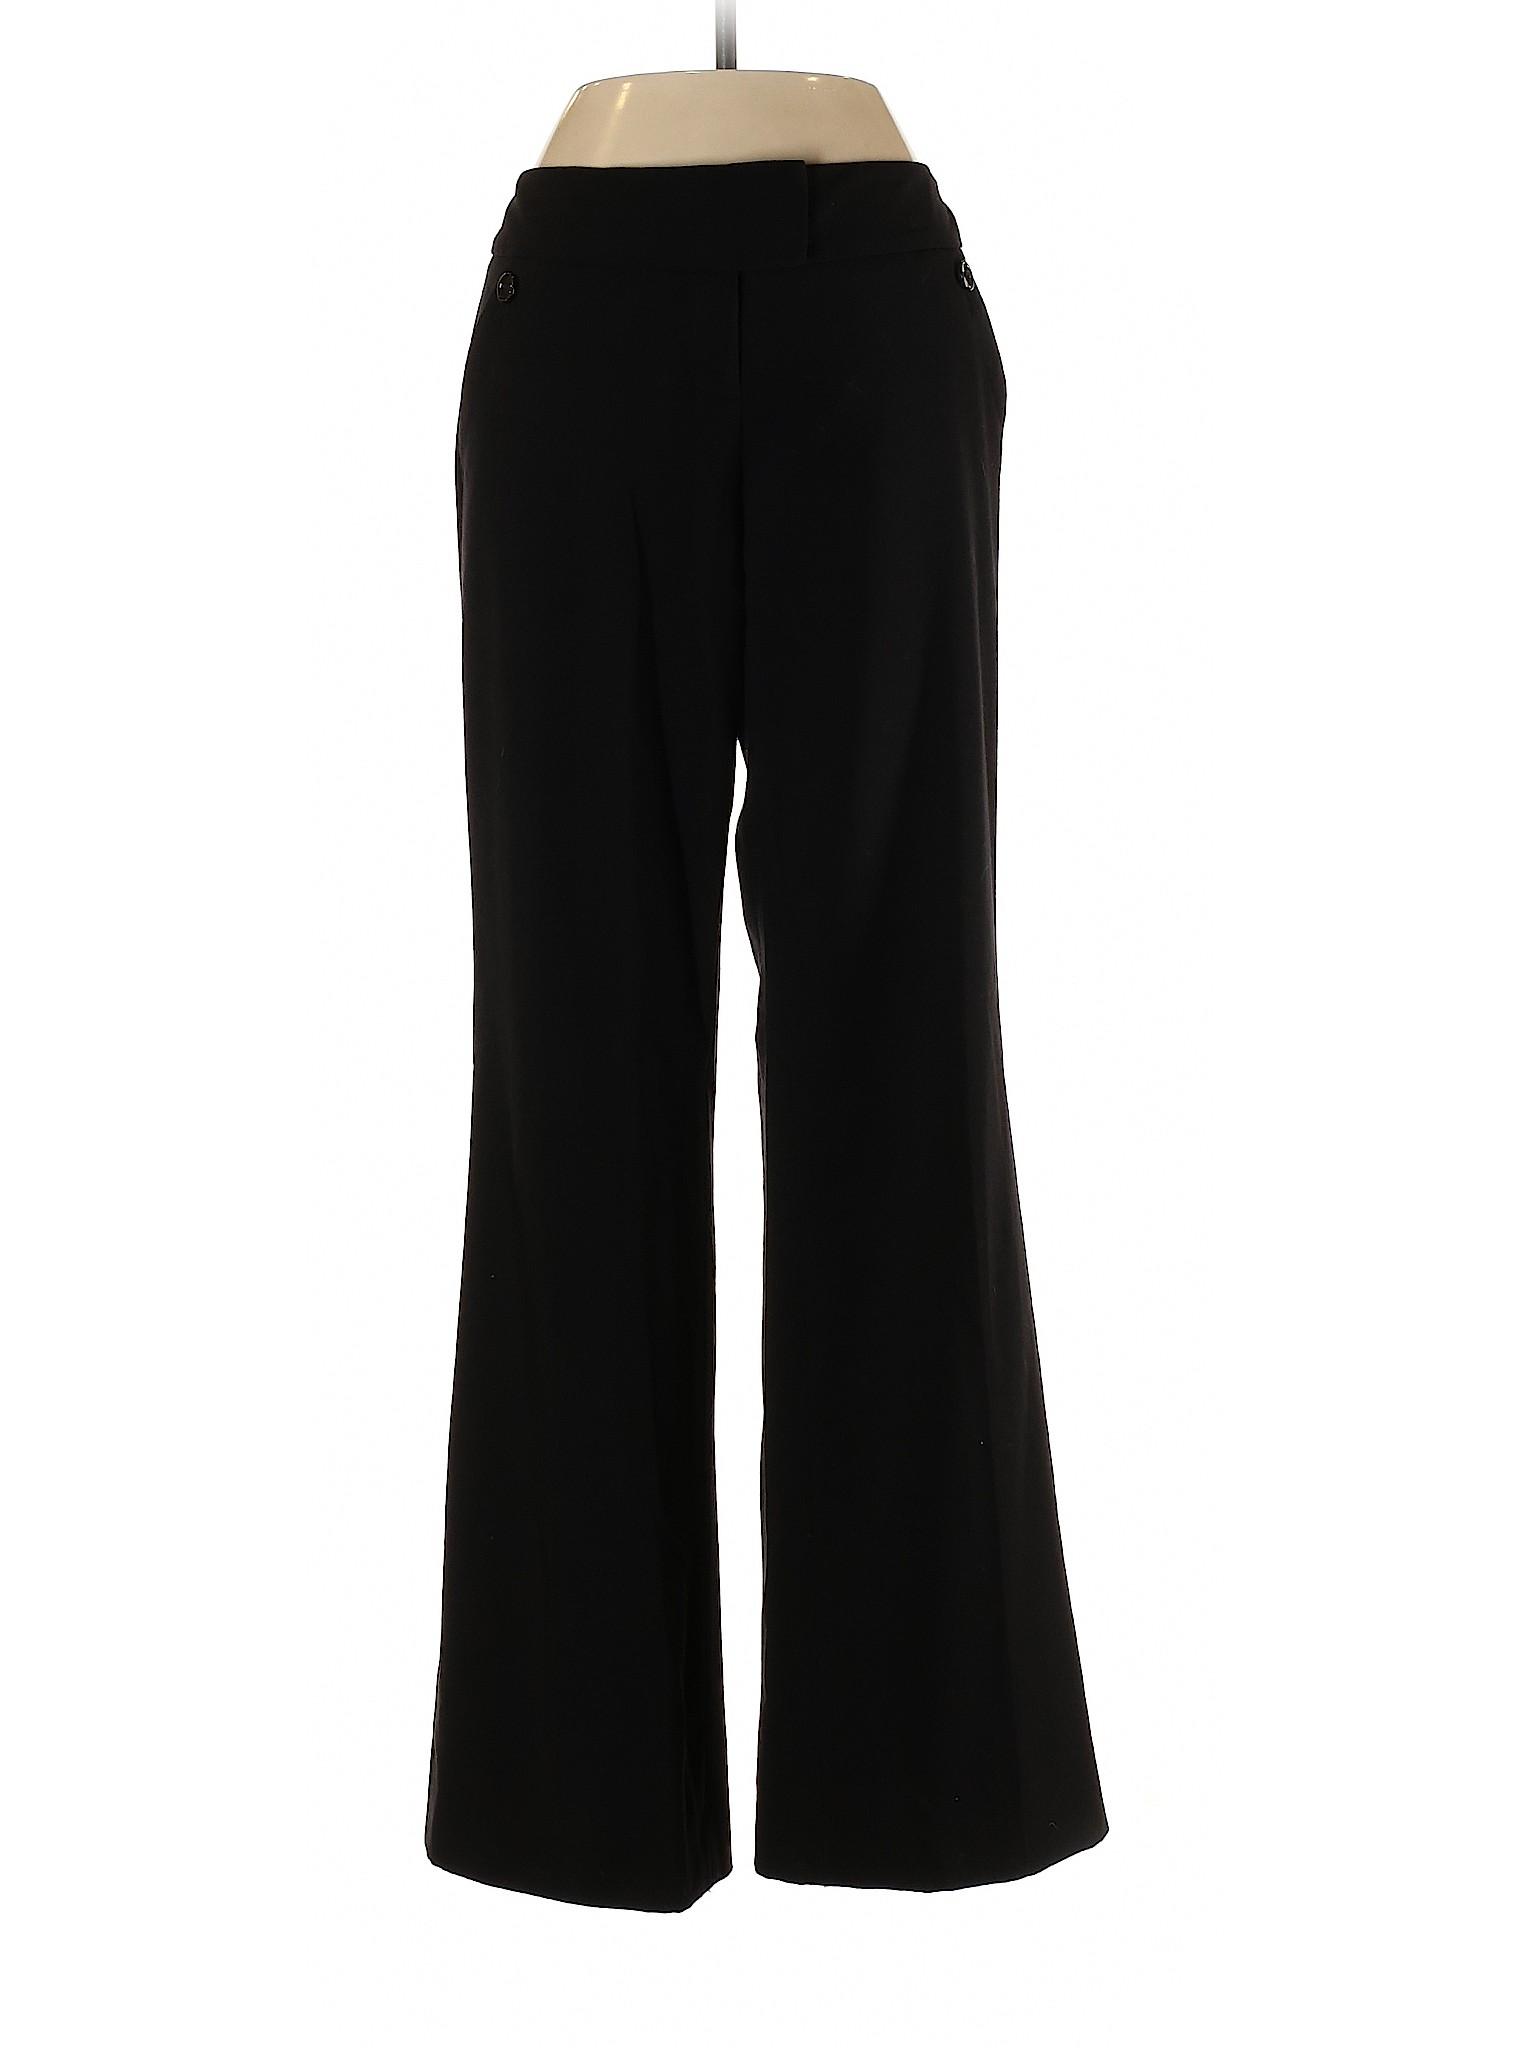 535d7cf2 Dress Pants